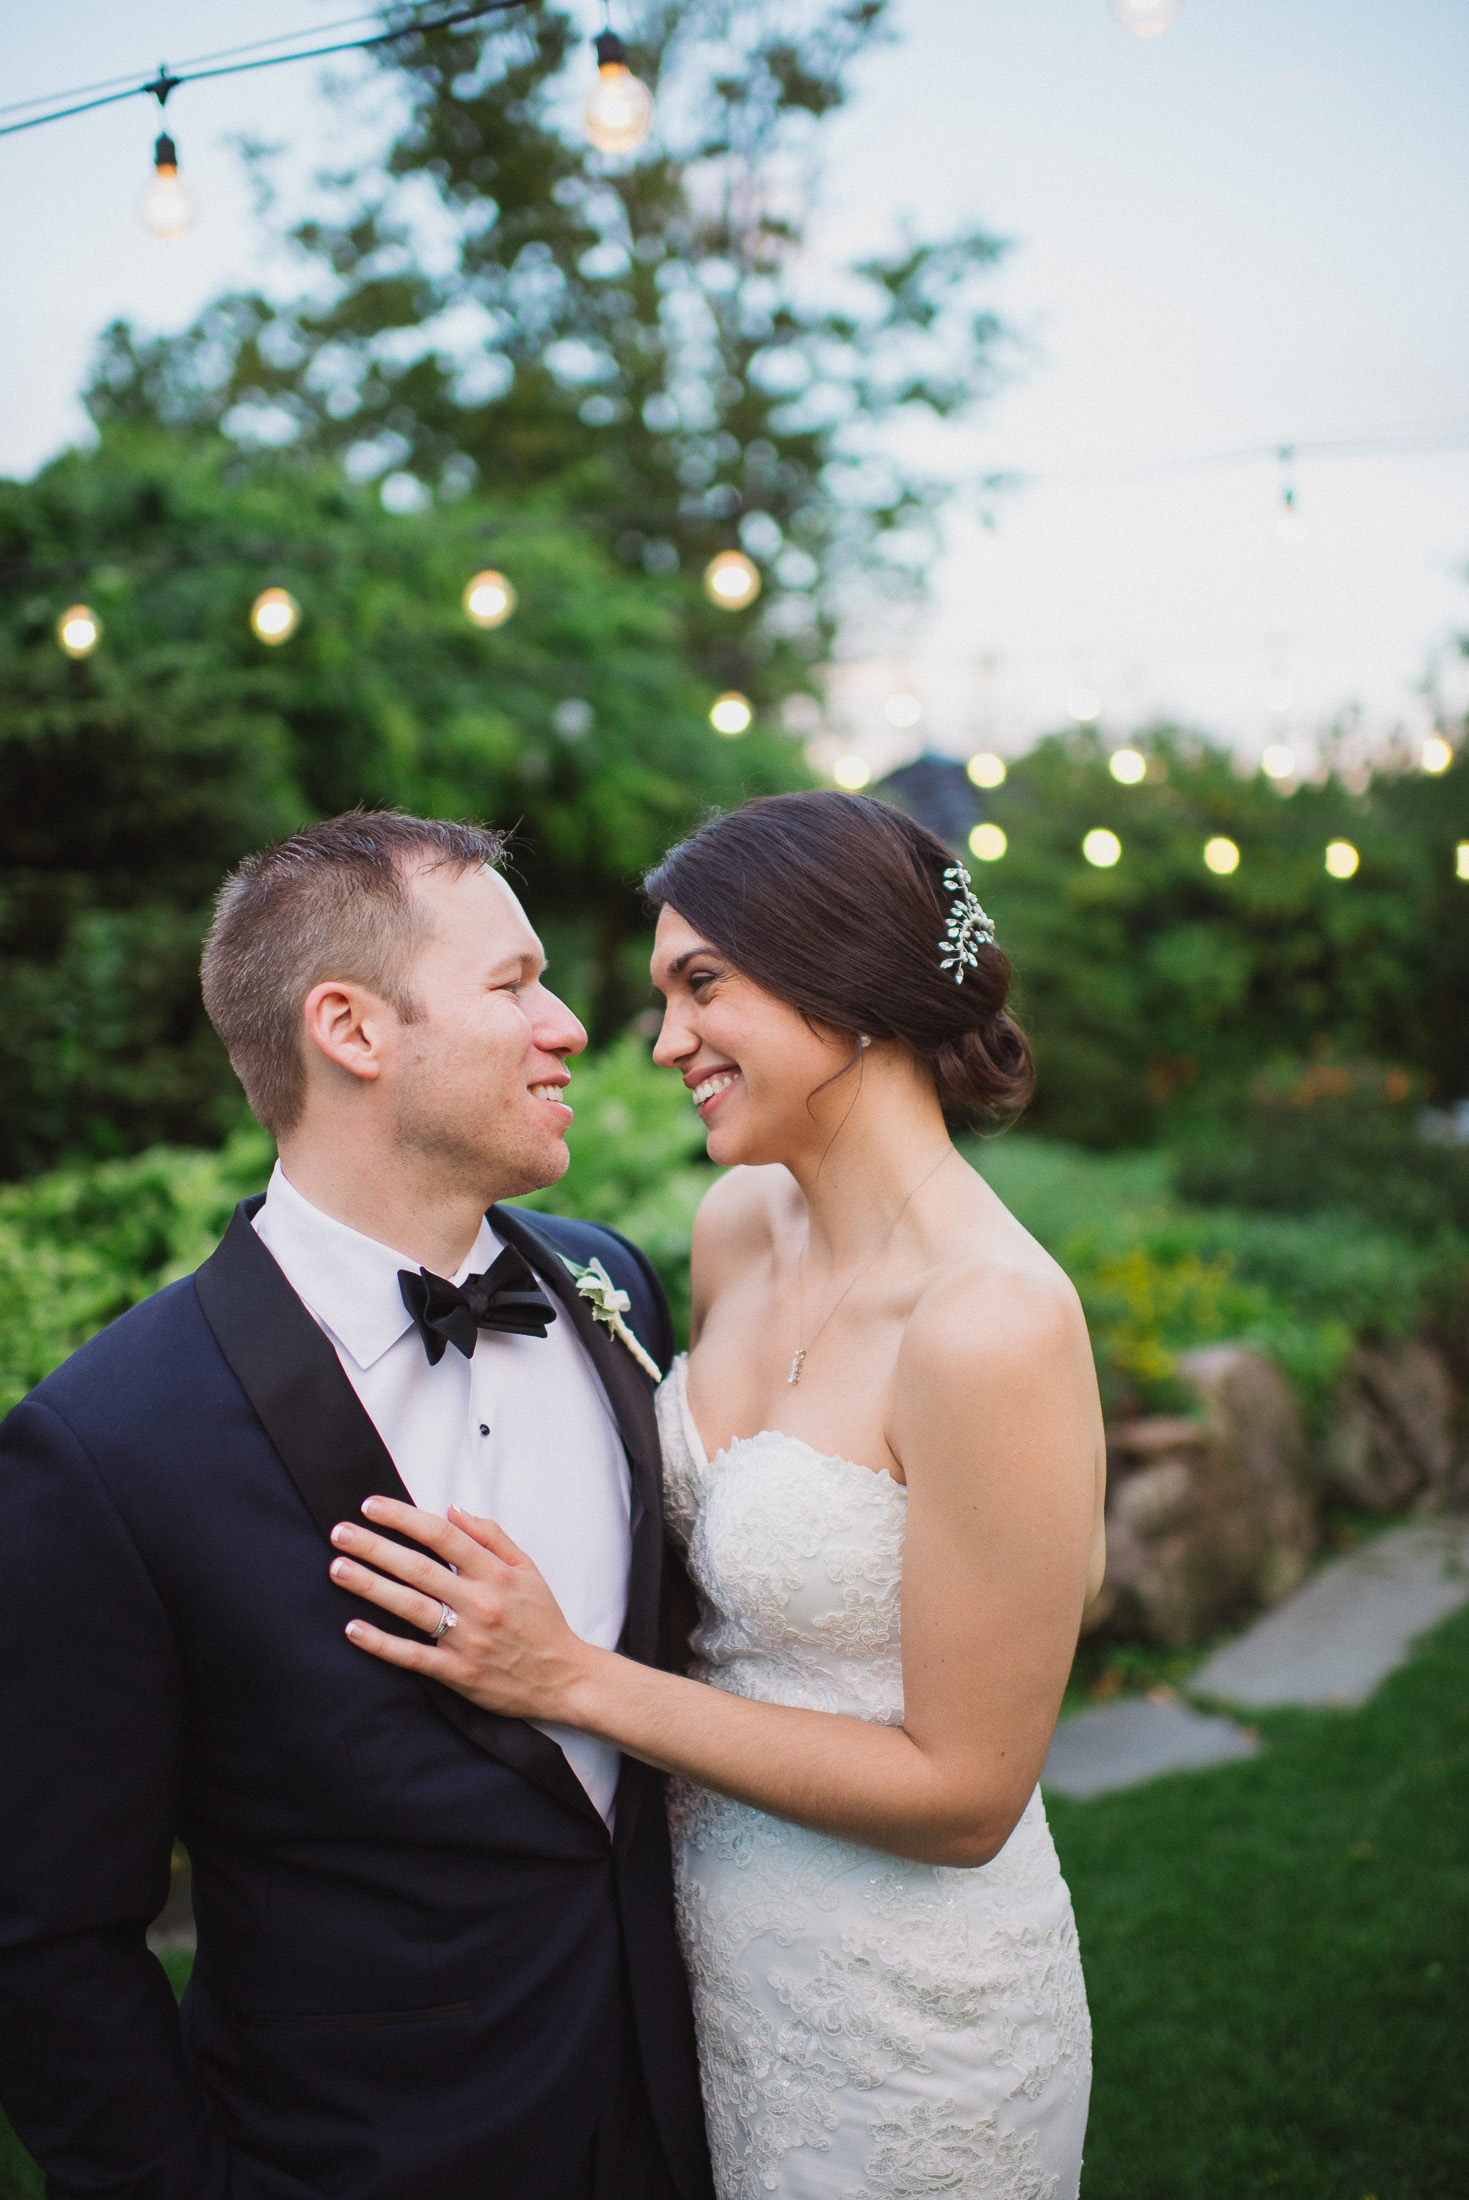 NH Wedding Photographer: bride and groom